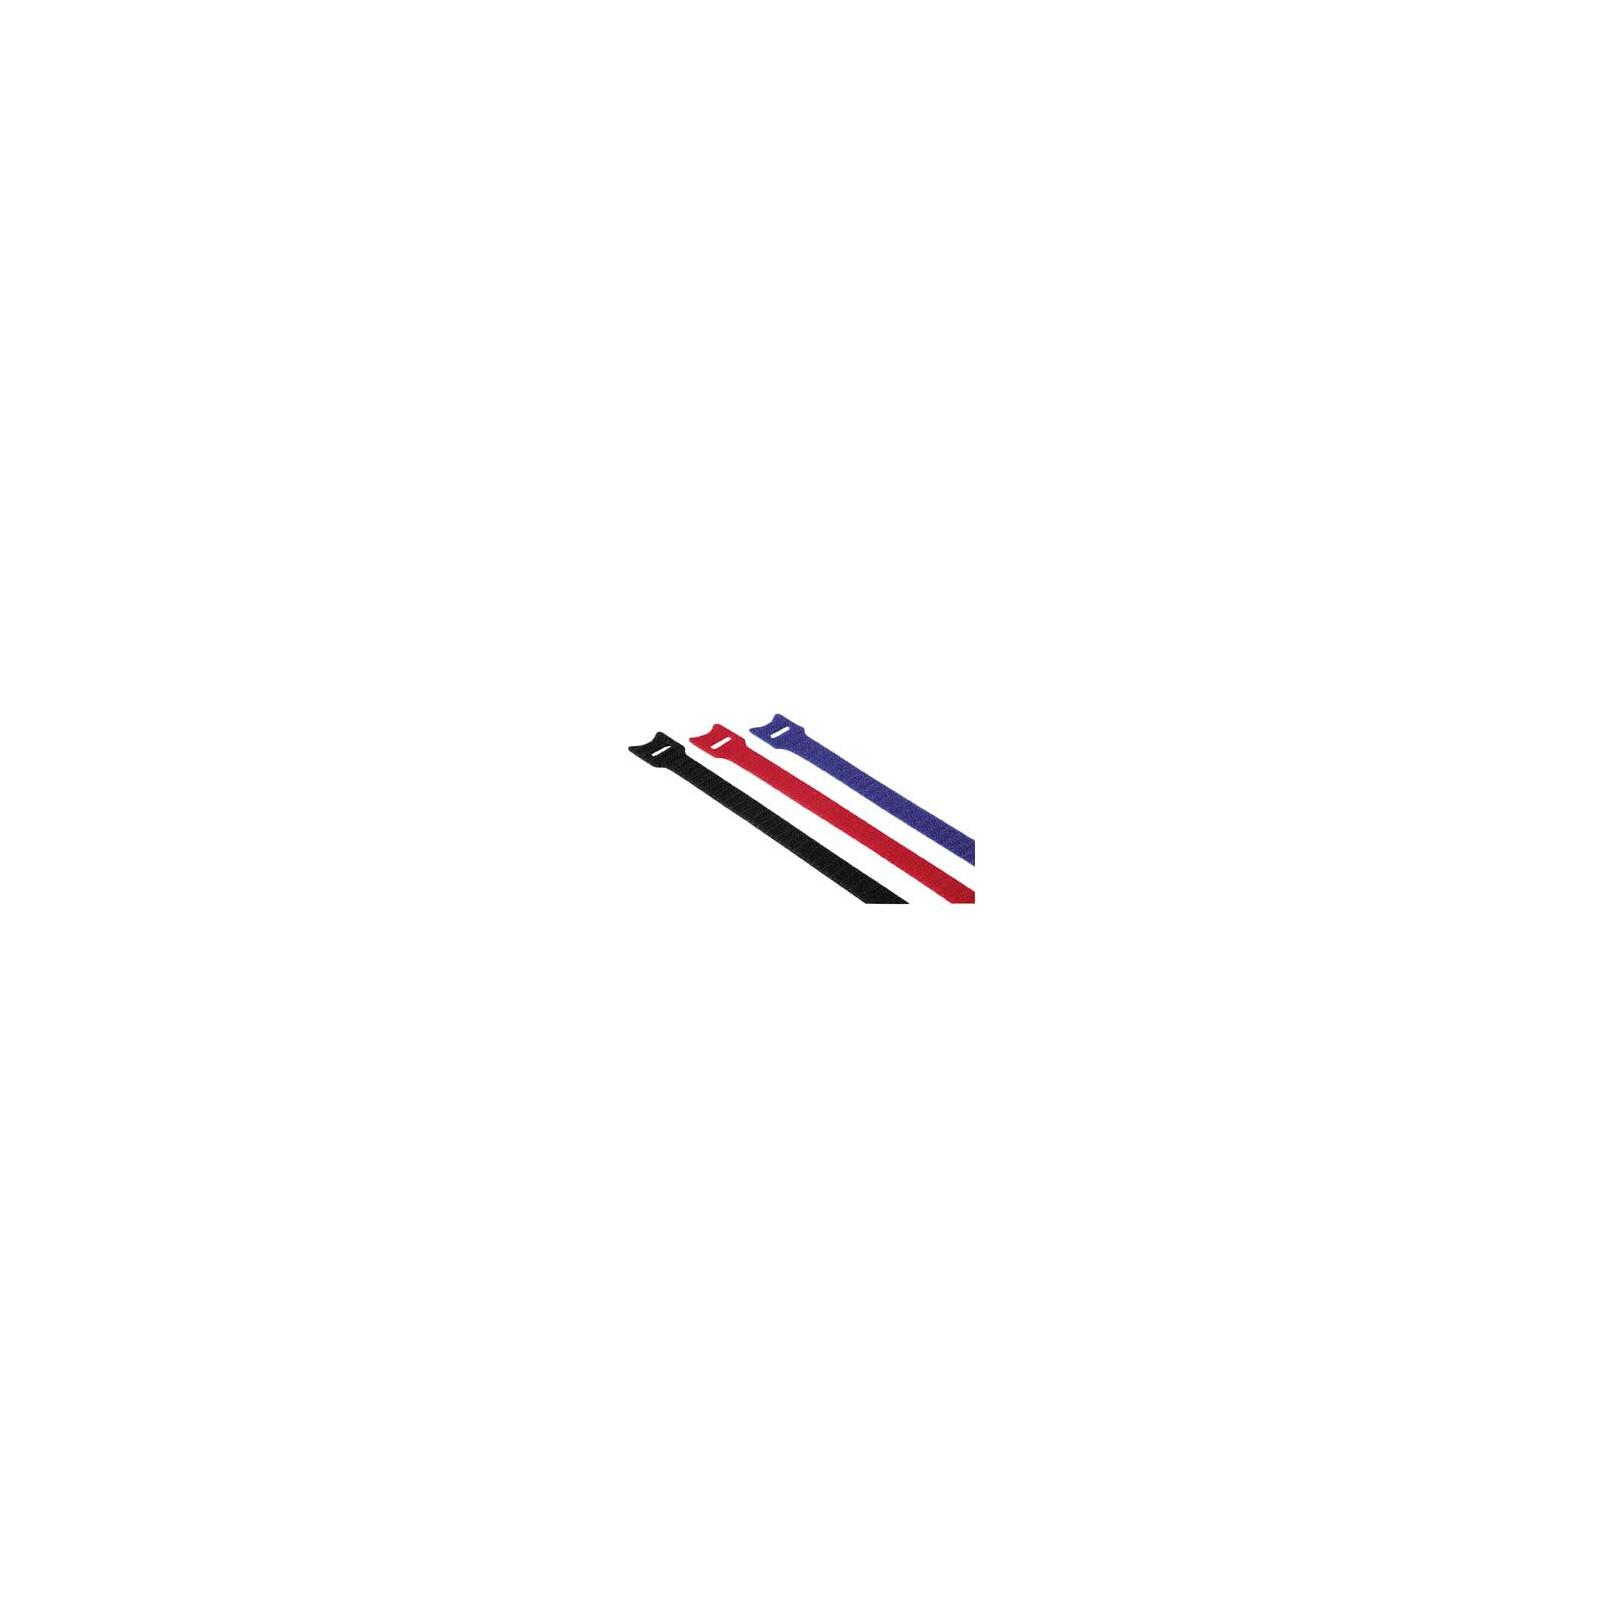 Hama 20537 Klett-Kabelbinder 200 mm farbig